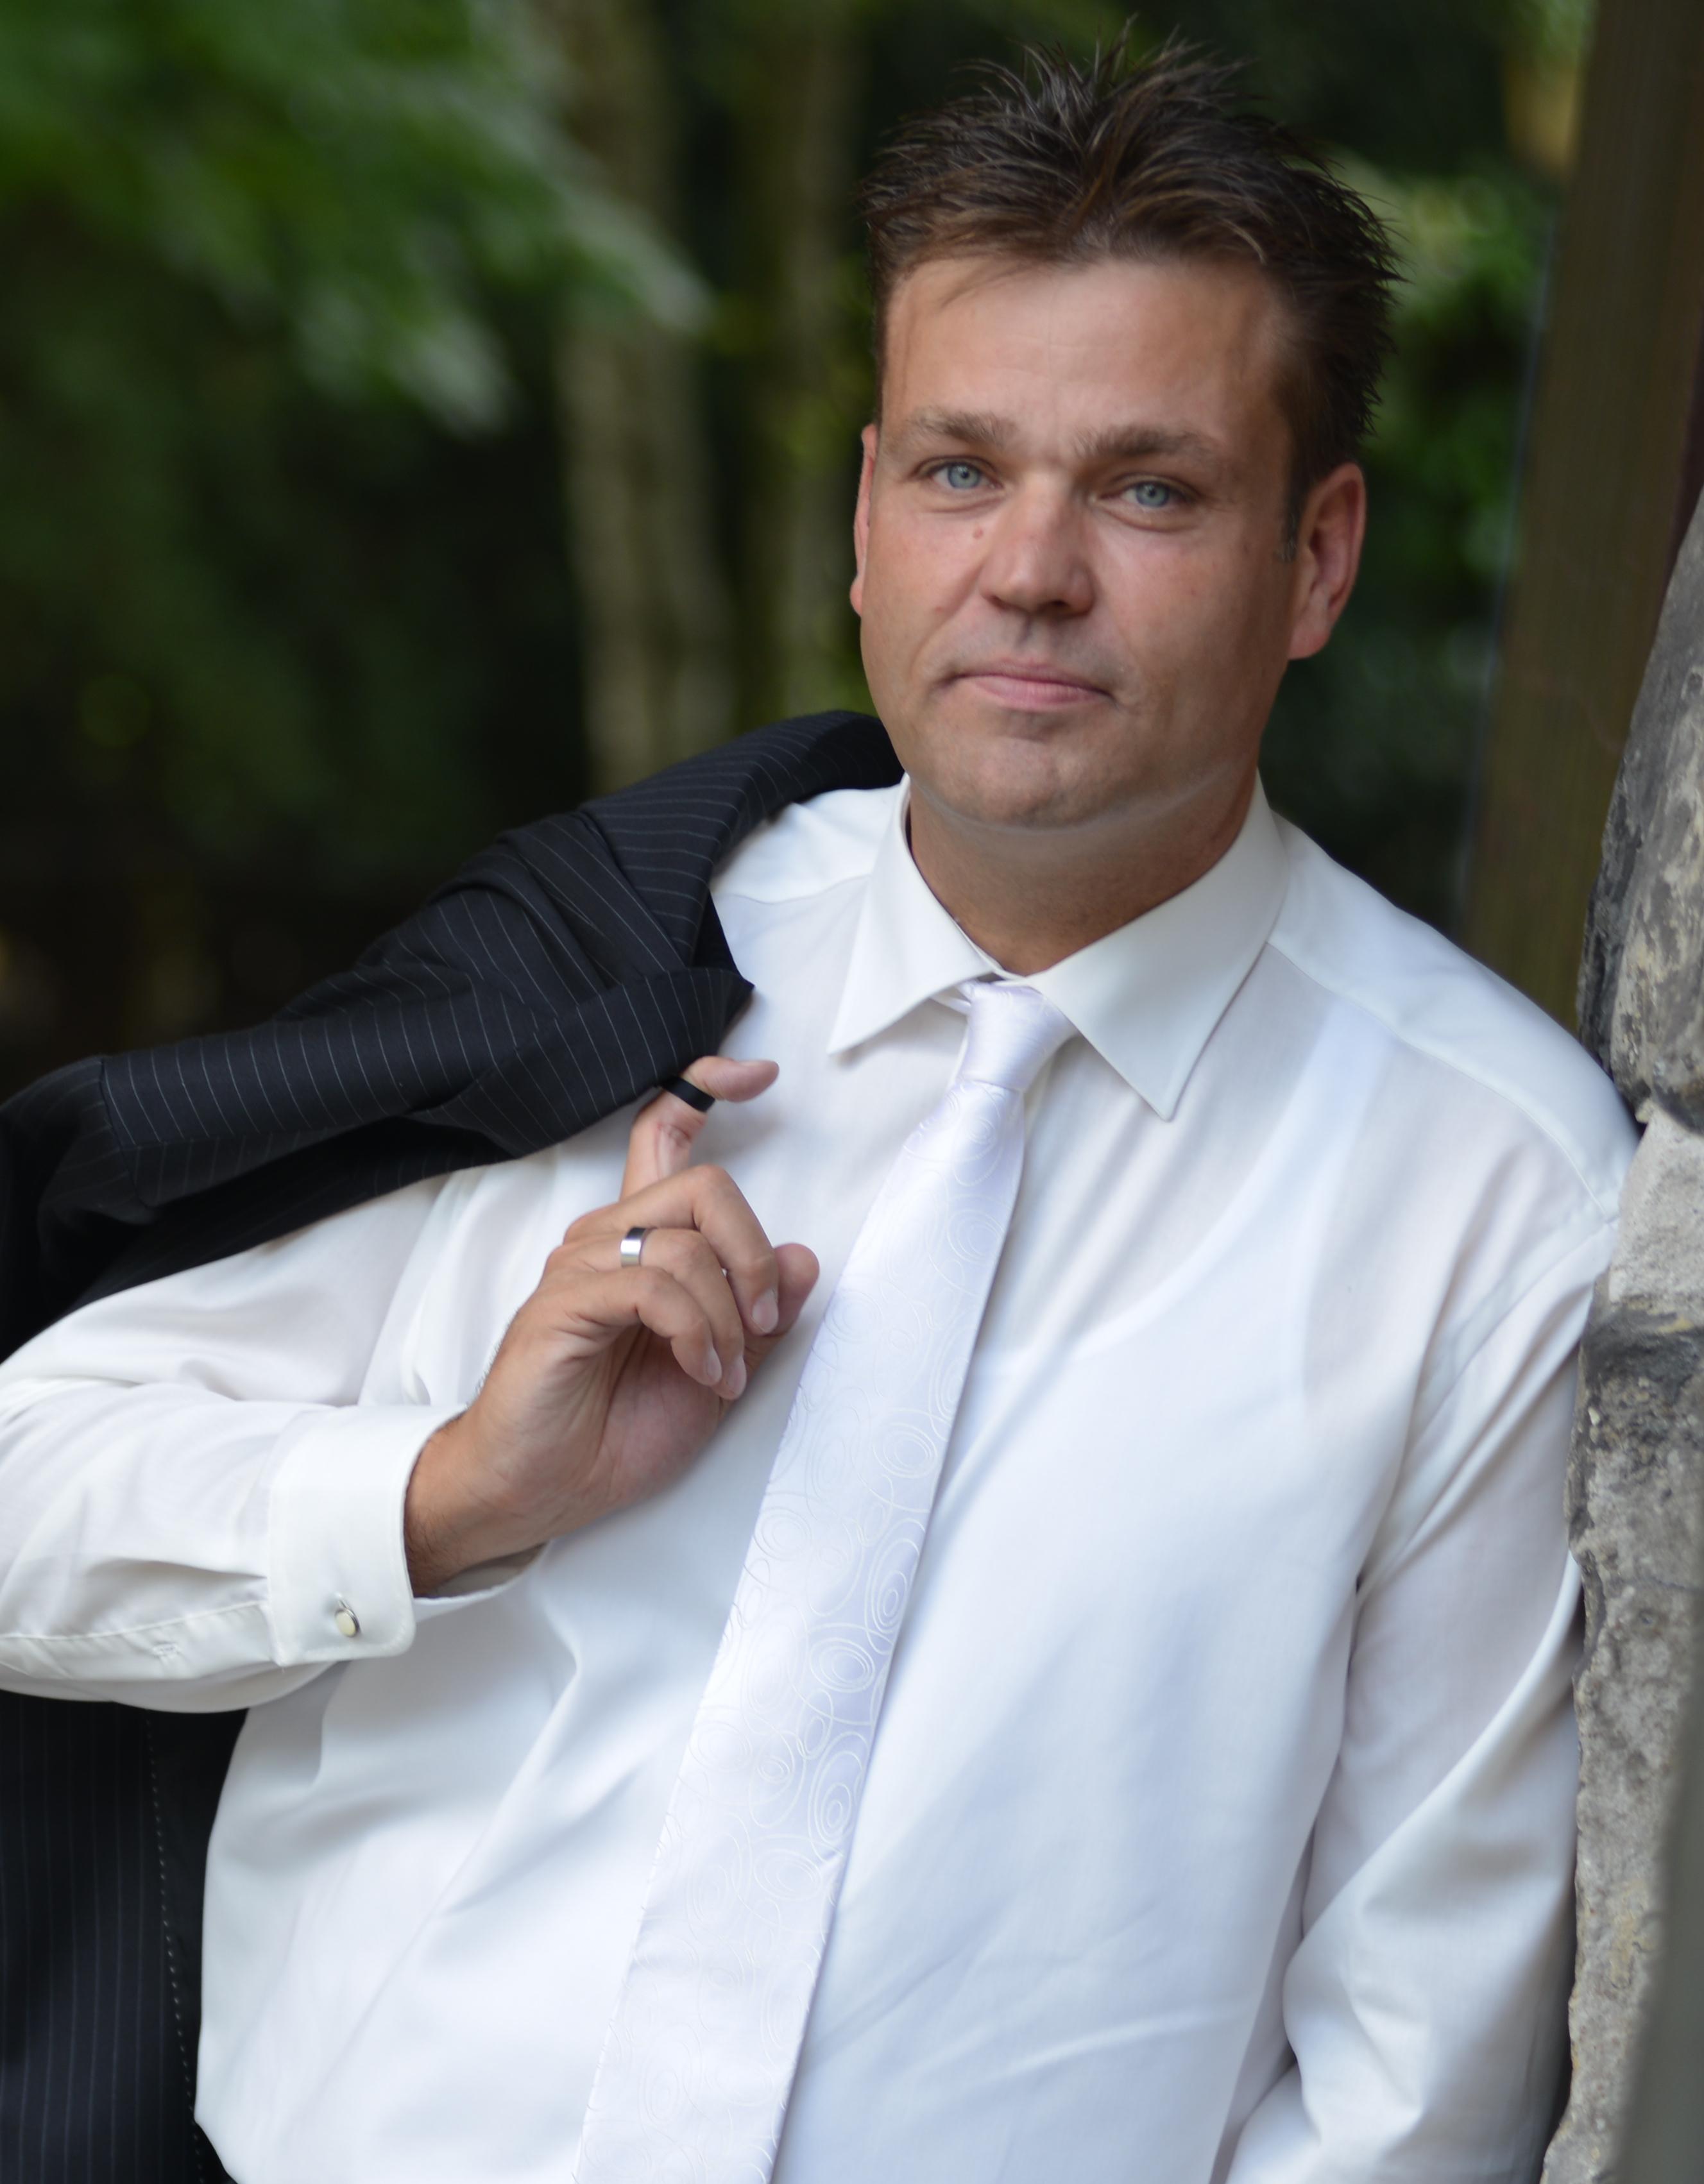 Rechtsanwalt Und Notar Dinslaken Fachanwalt Anwalt Paust